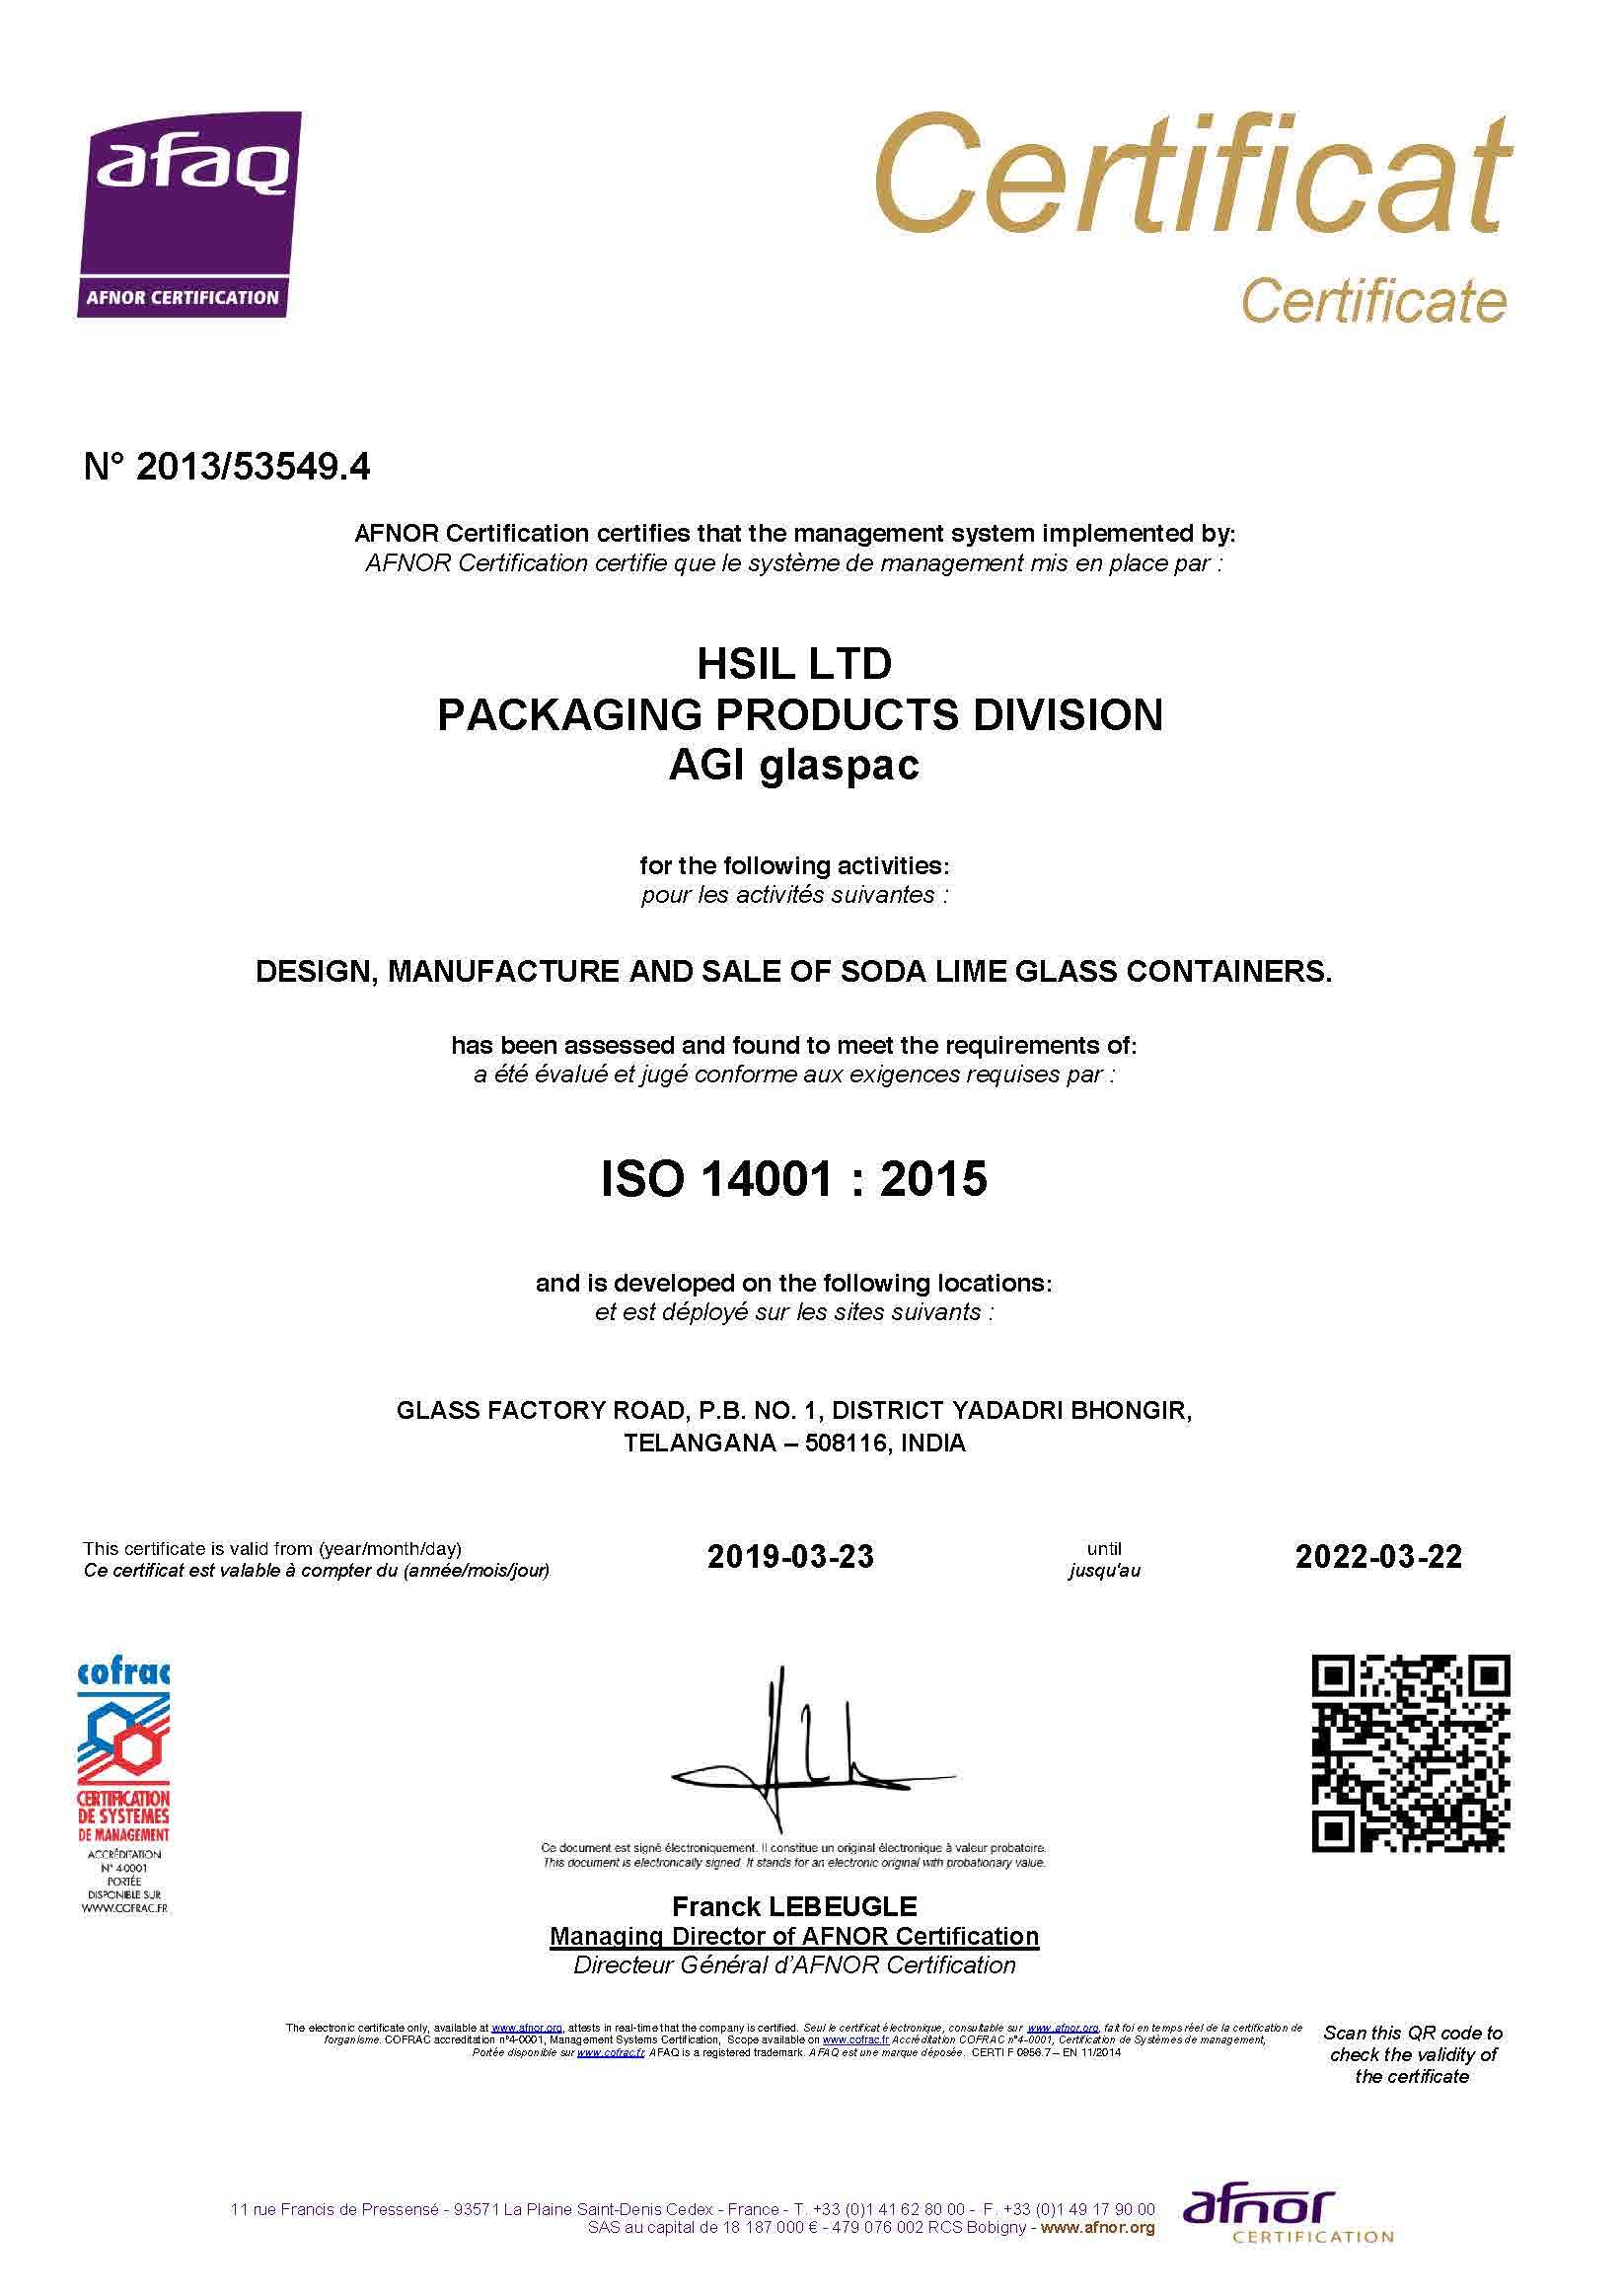 ISO 14001:2015布宏吉尔证书